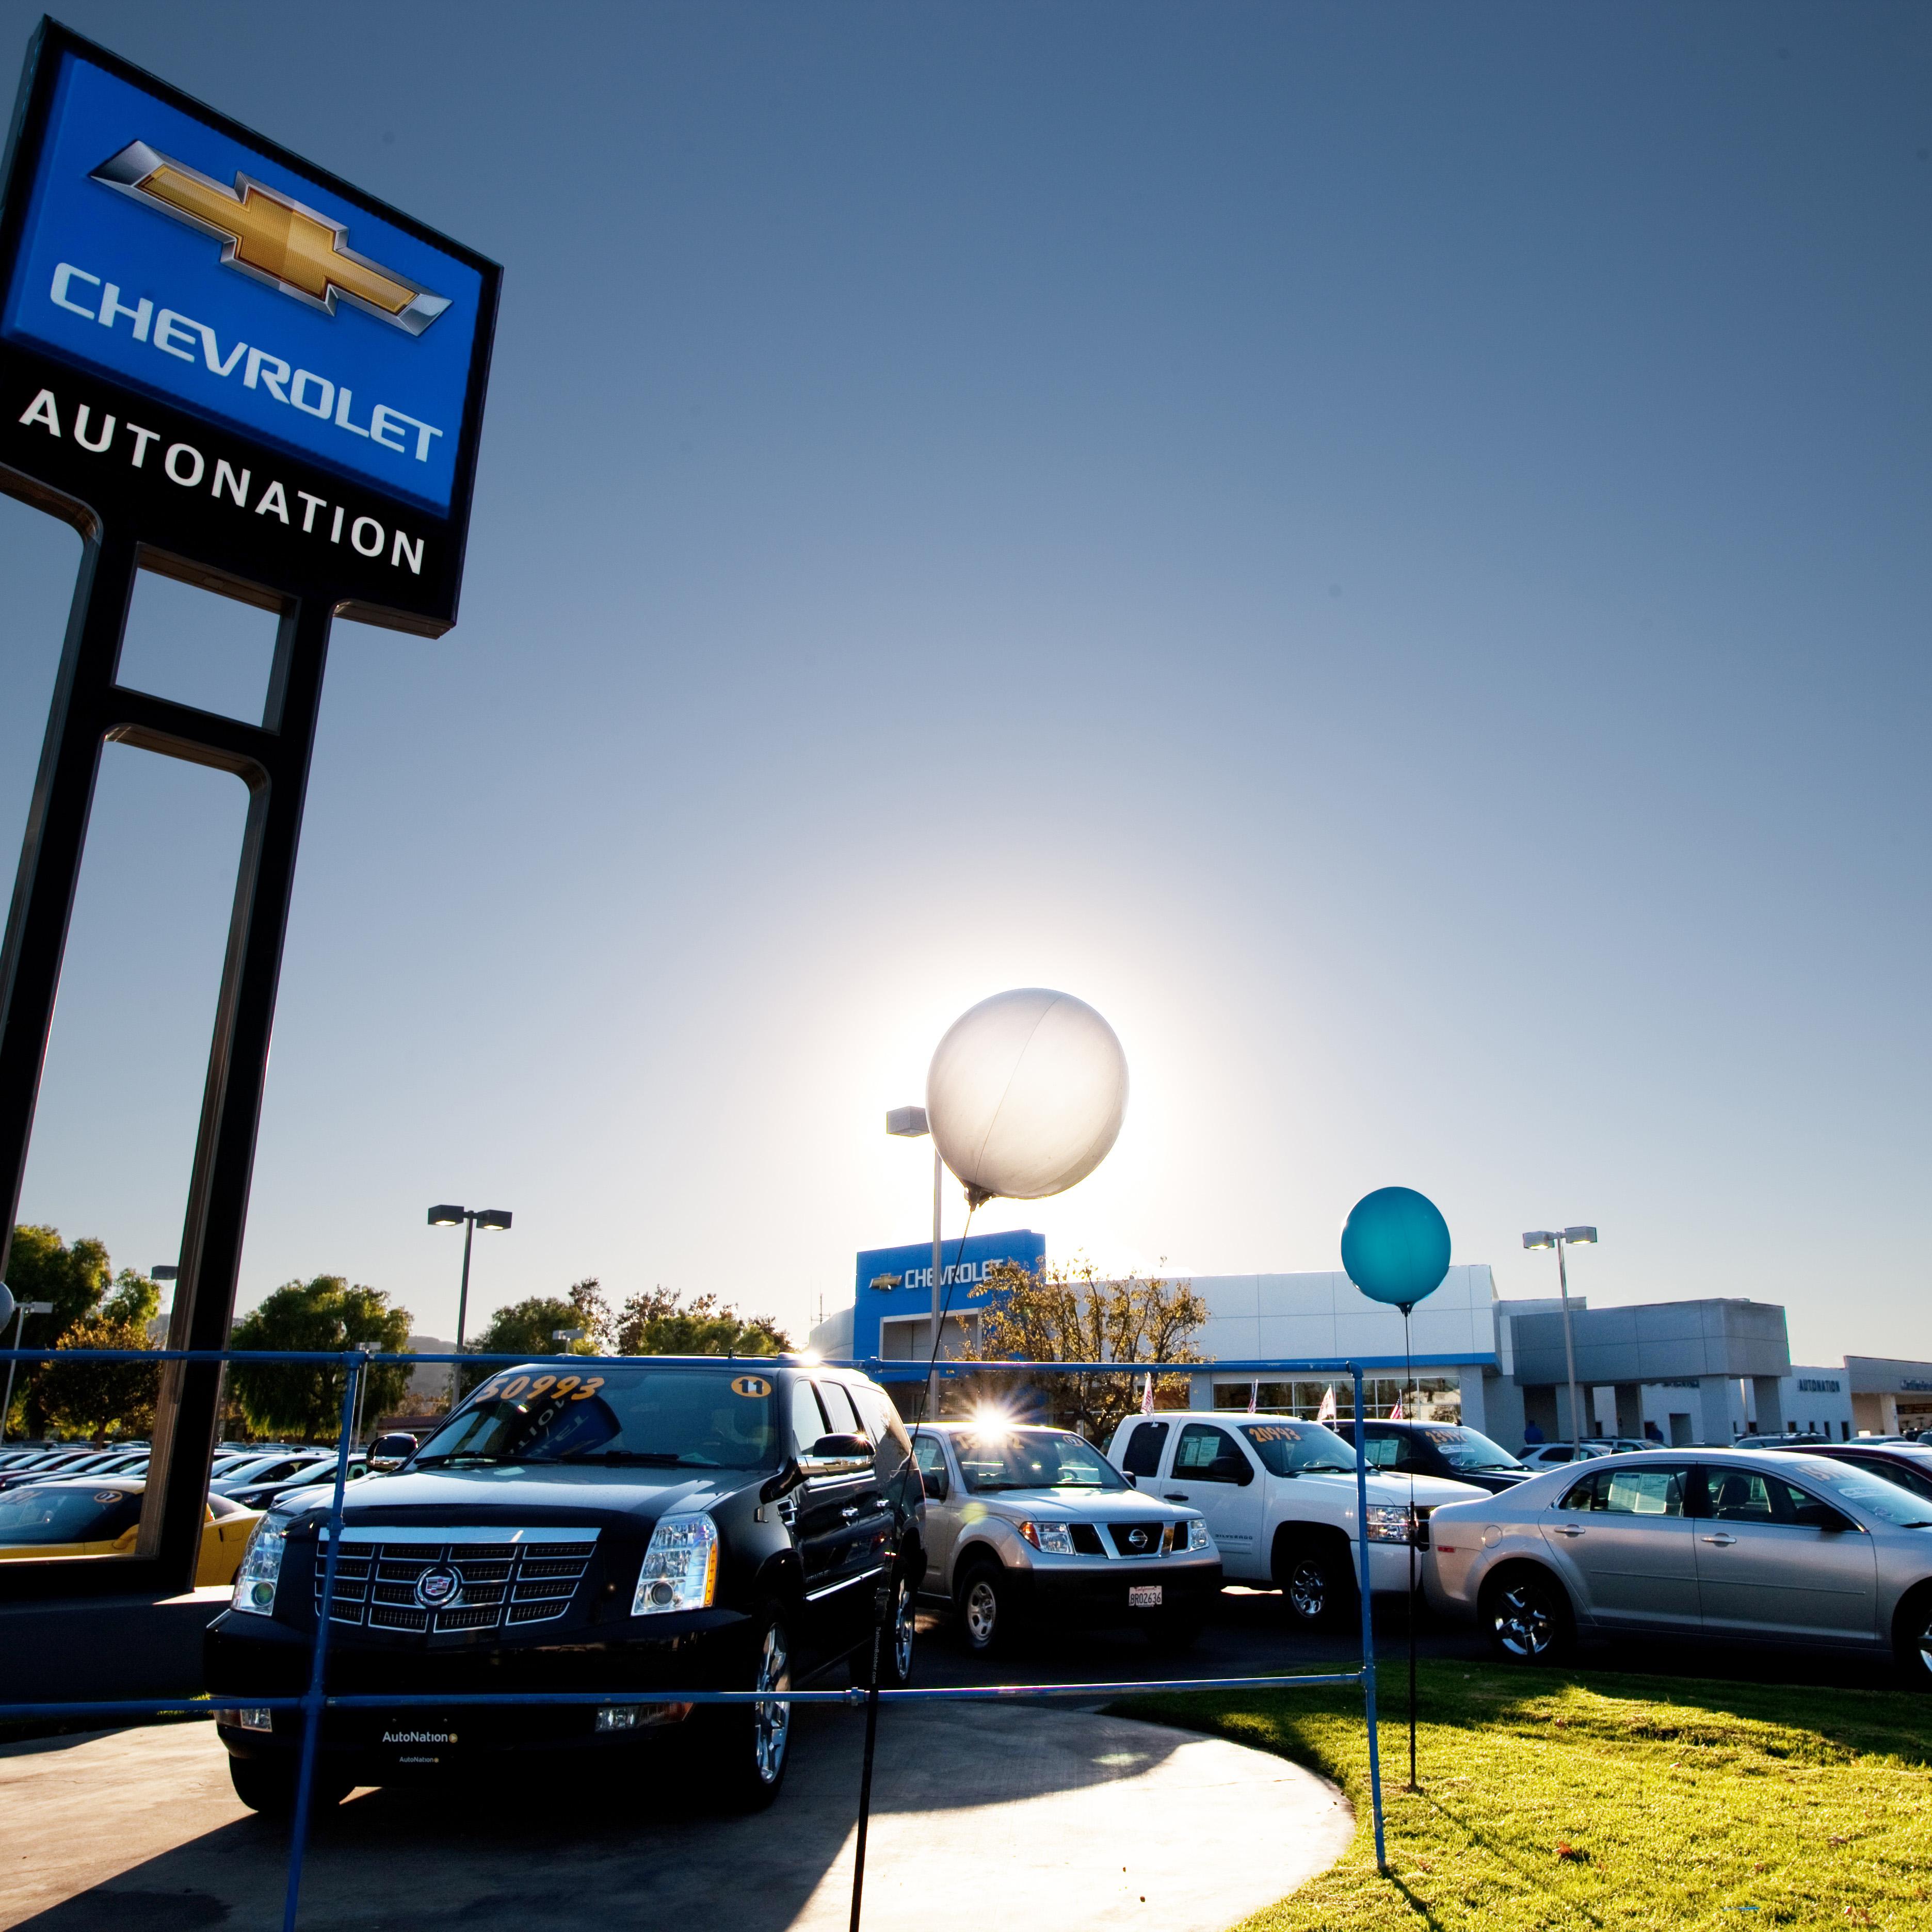 Chevrolet Dealer Nearby: AutoNation Chevrolet Valencia, Valencia California (CA